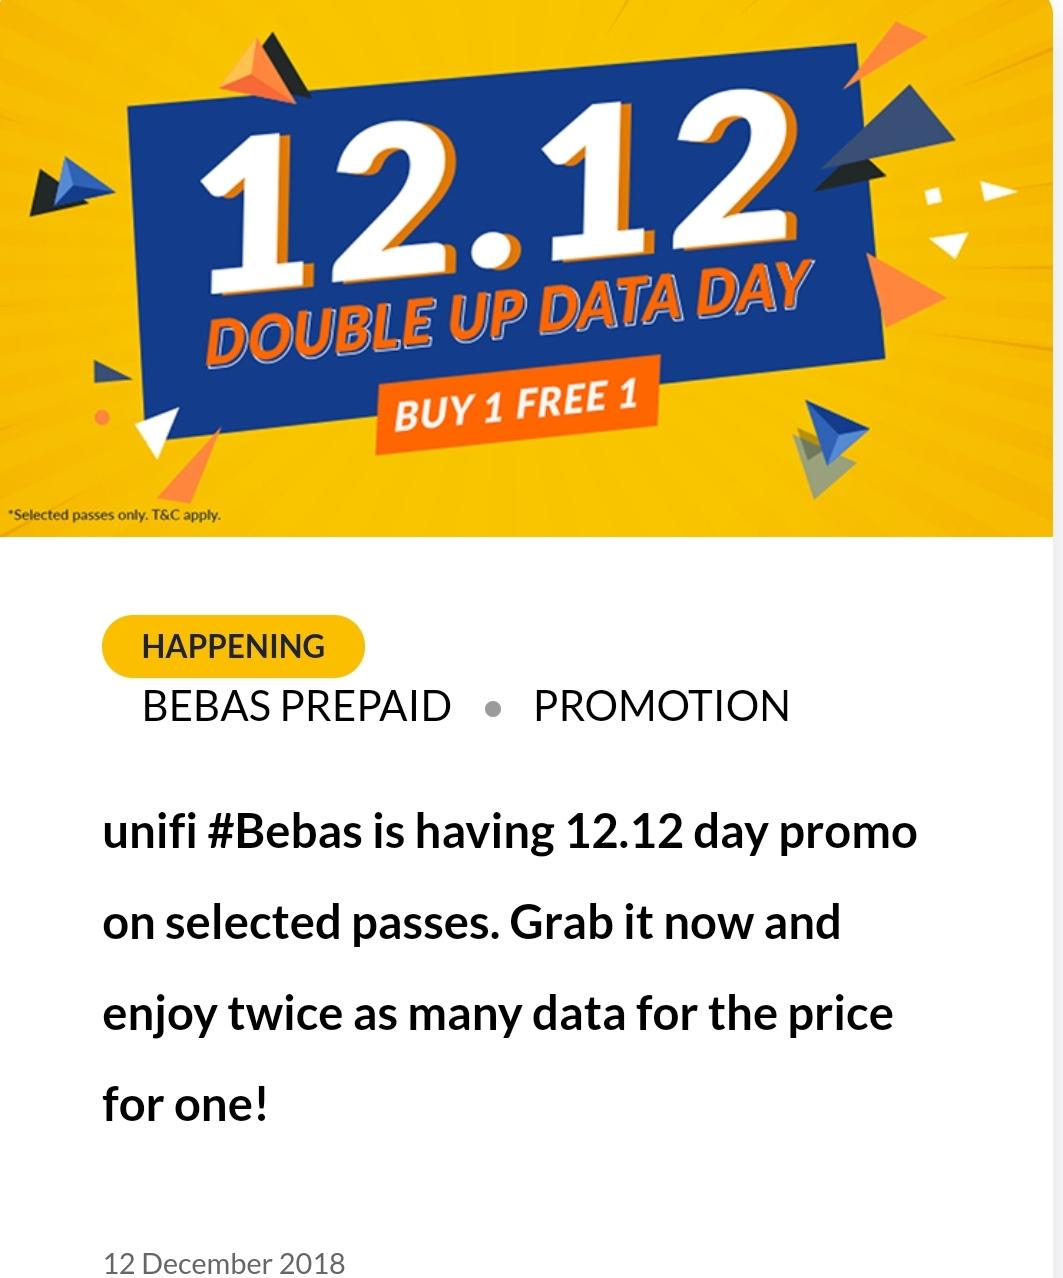 Unifi Mobile Buy 1 Free 1 12 12 Promo